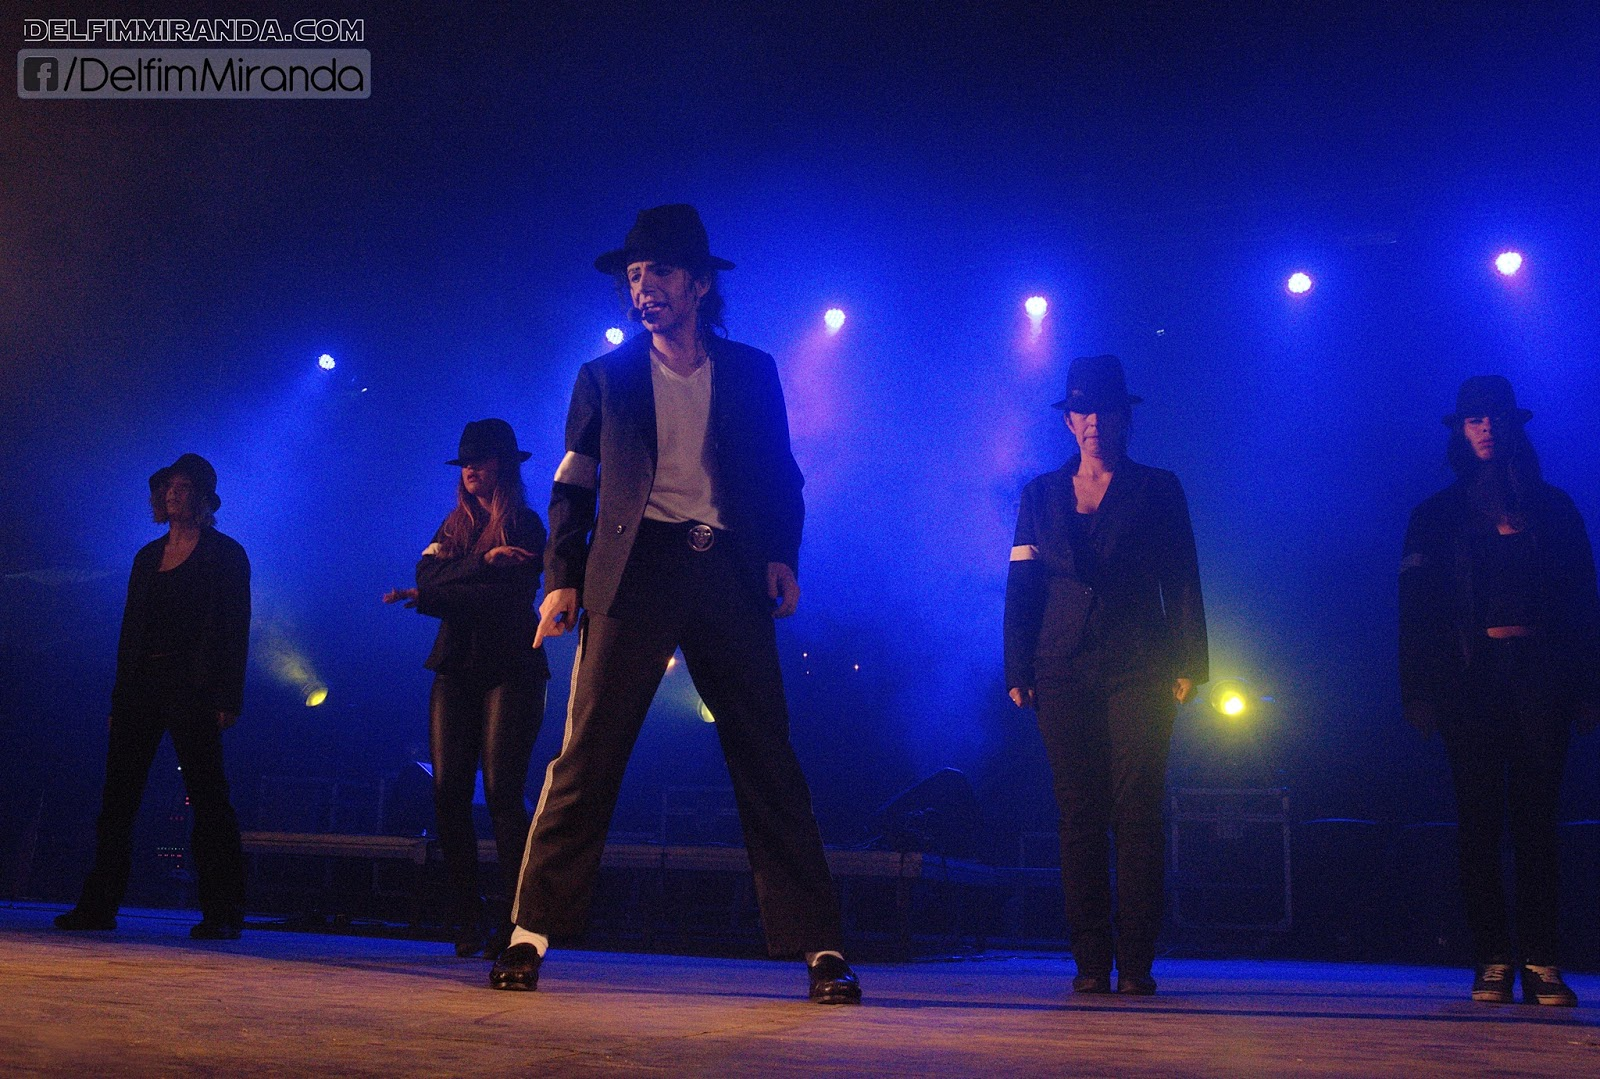 Delfim Miranda - Michael Jackson Tribute - Smooth Criminal - Live on stage